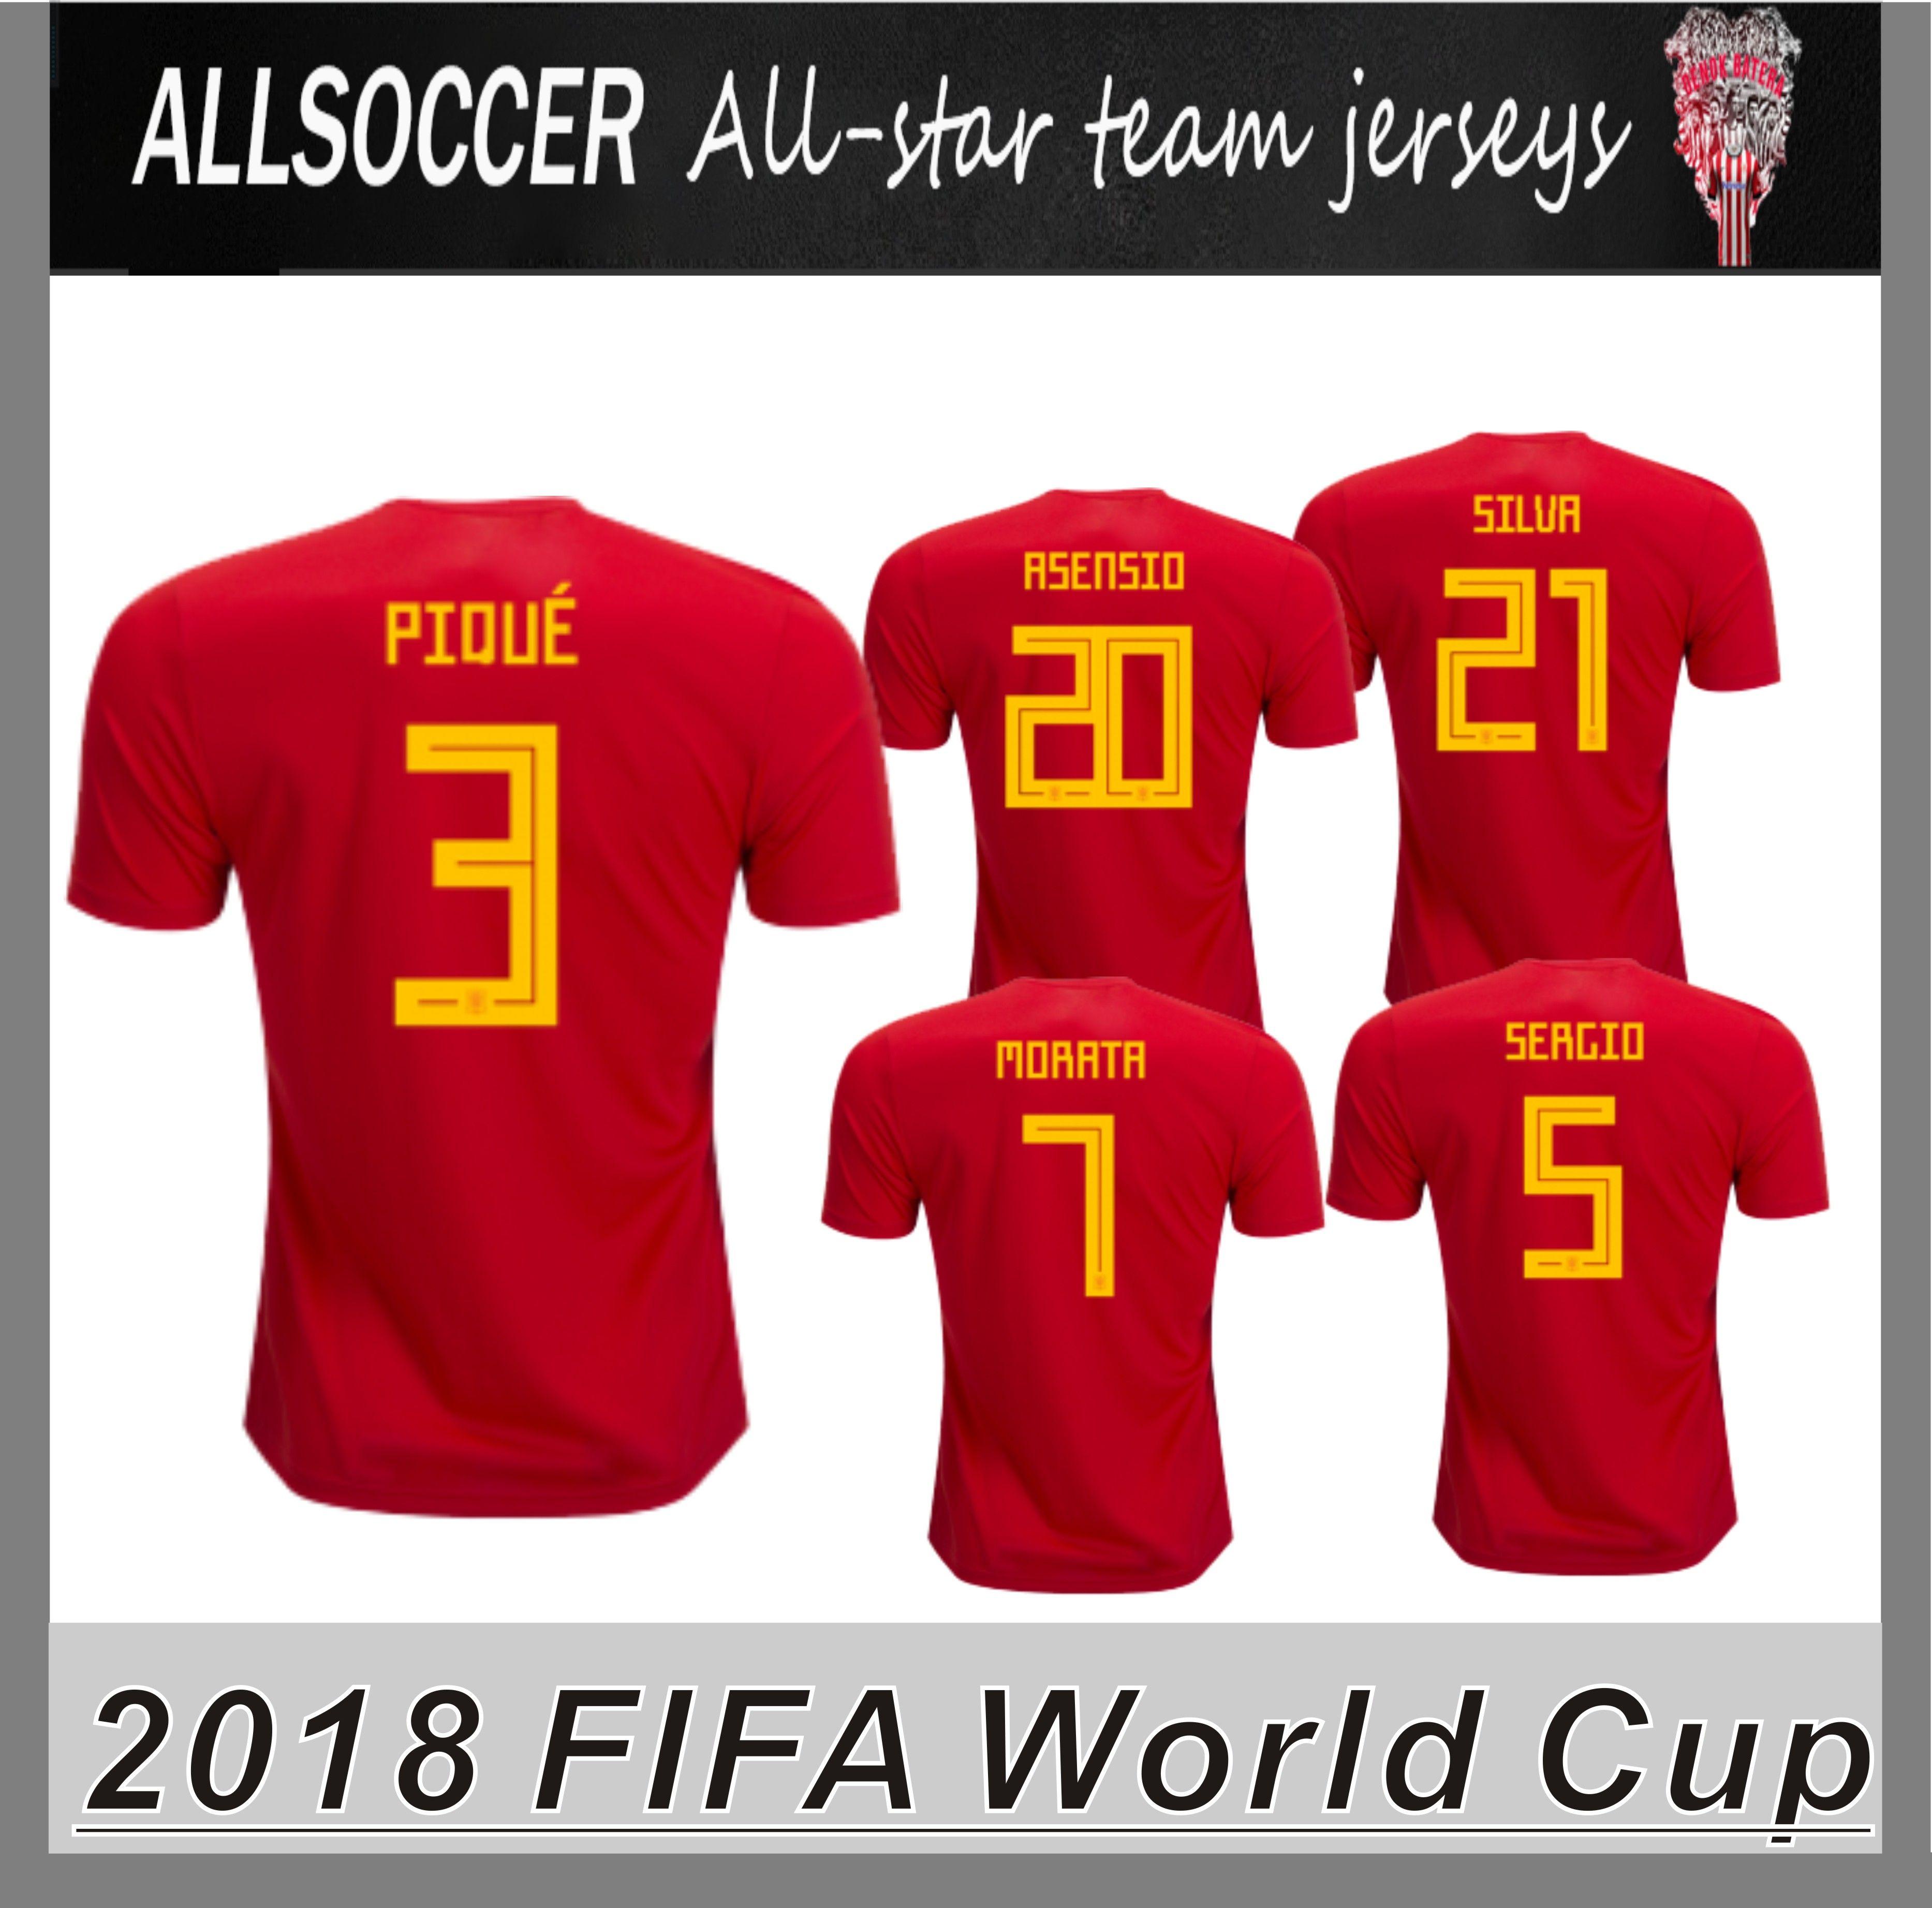 0634727668e6b Copa Mundial 2018 JERSEYS España Inicio Camisetas De Fútbol Marco Asensio  Pique ISCO Andrés Iniesta Sergio Ramos Alvaro Morata Sergio Busquets Por  Allsoccer ...